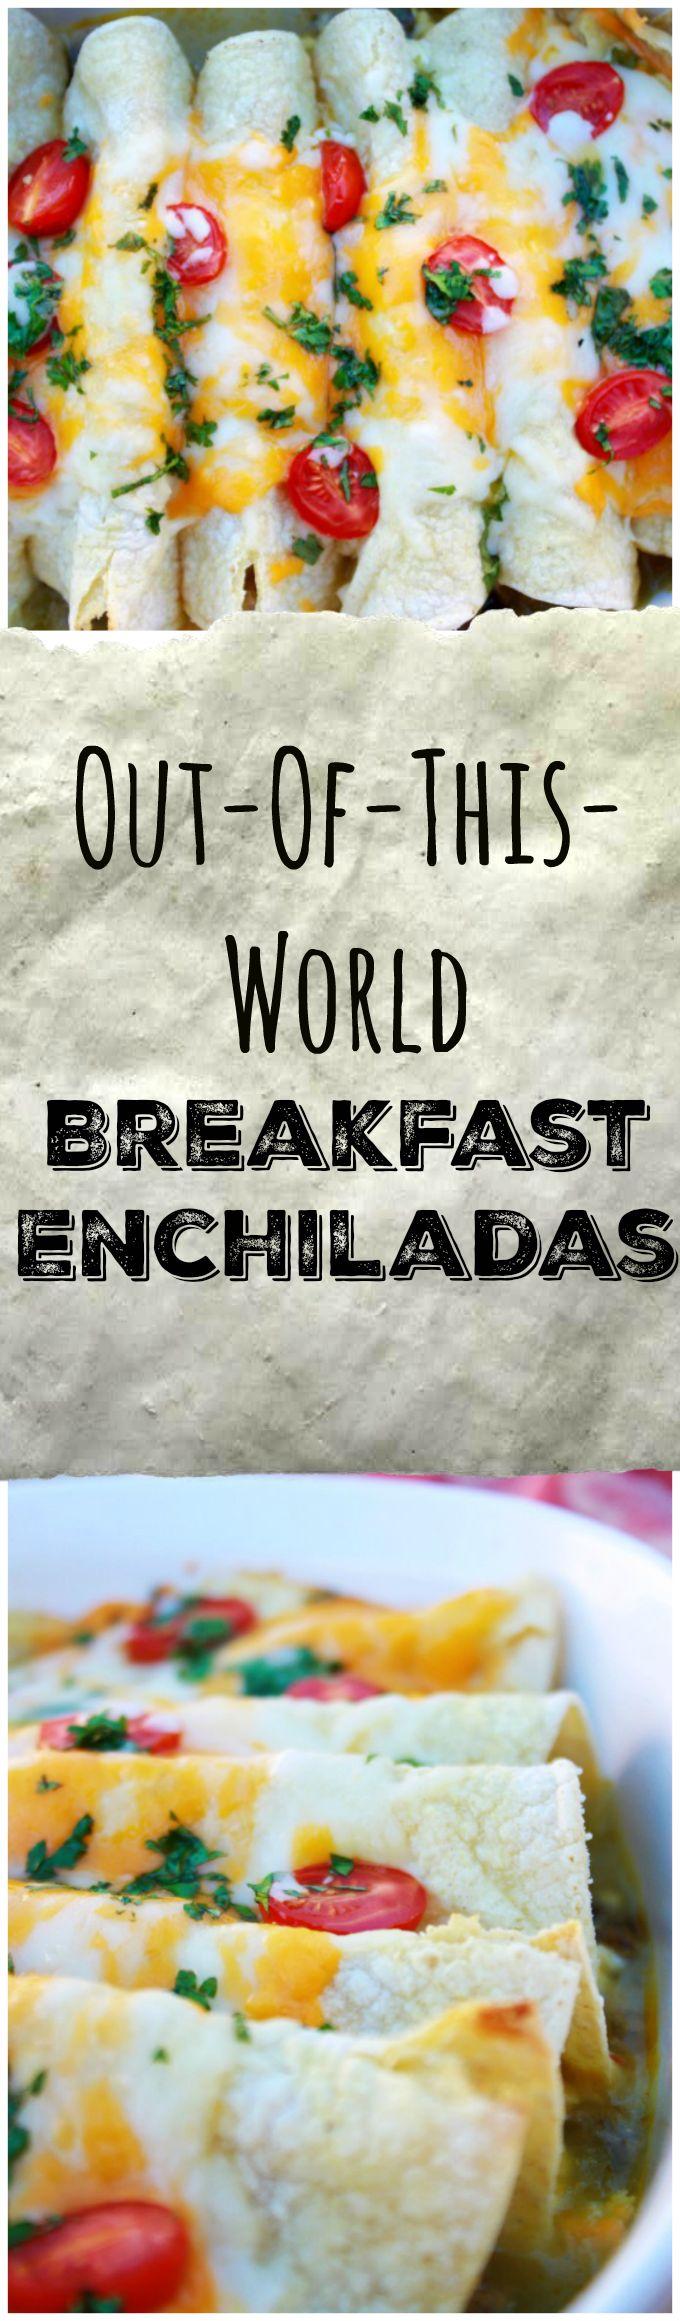 Breakfast Enchilada Recipe - The Funny Mom Blog